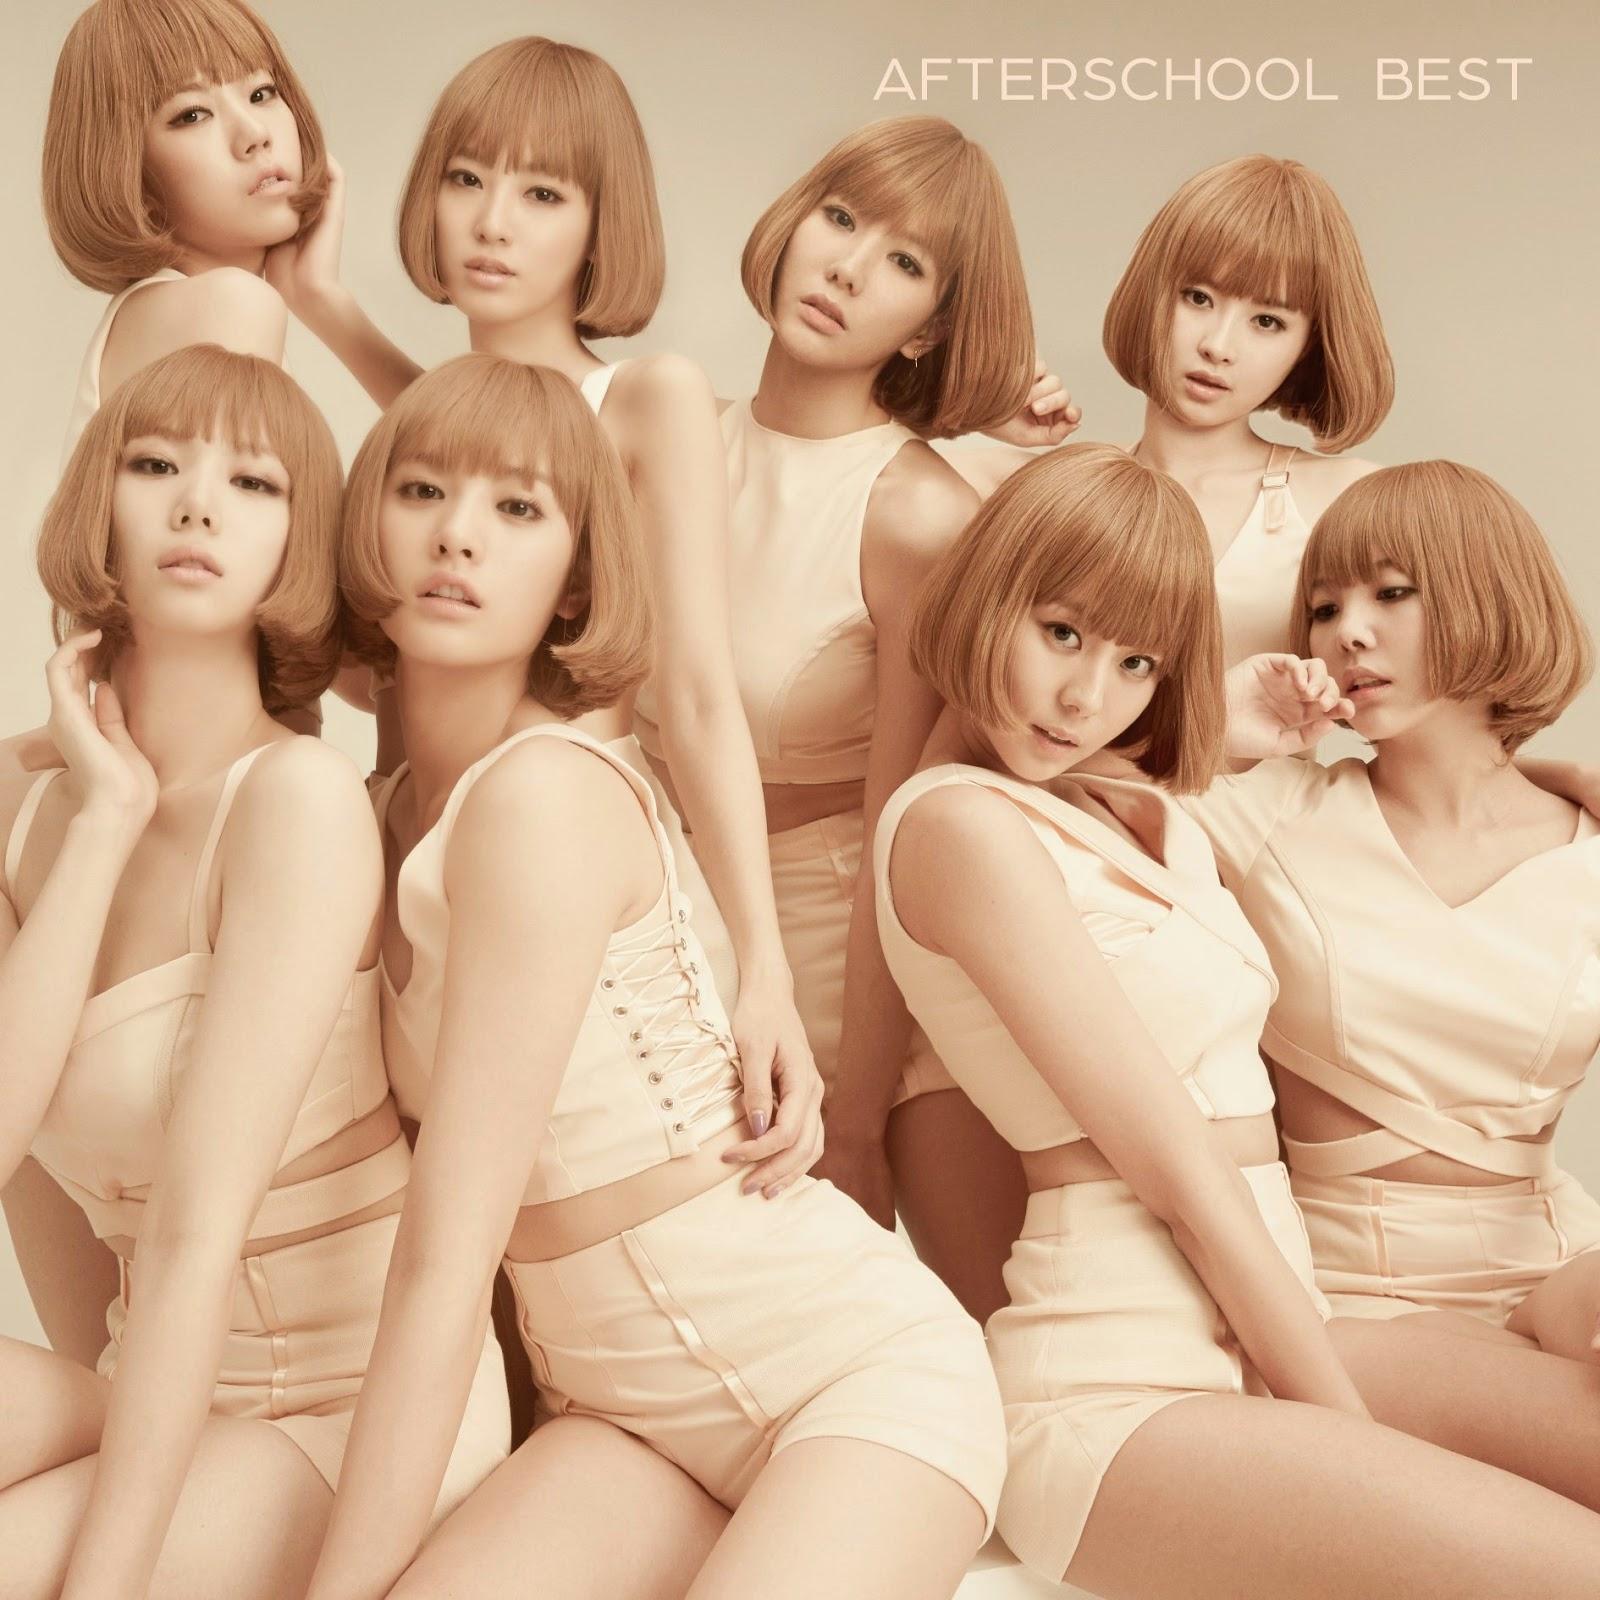 20151121.80 After School - BEST cover.jpg